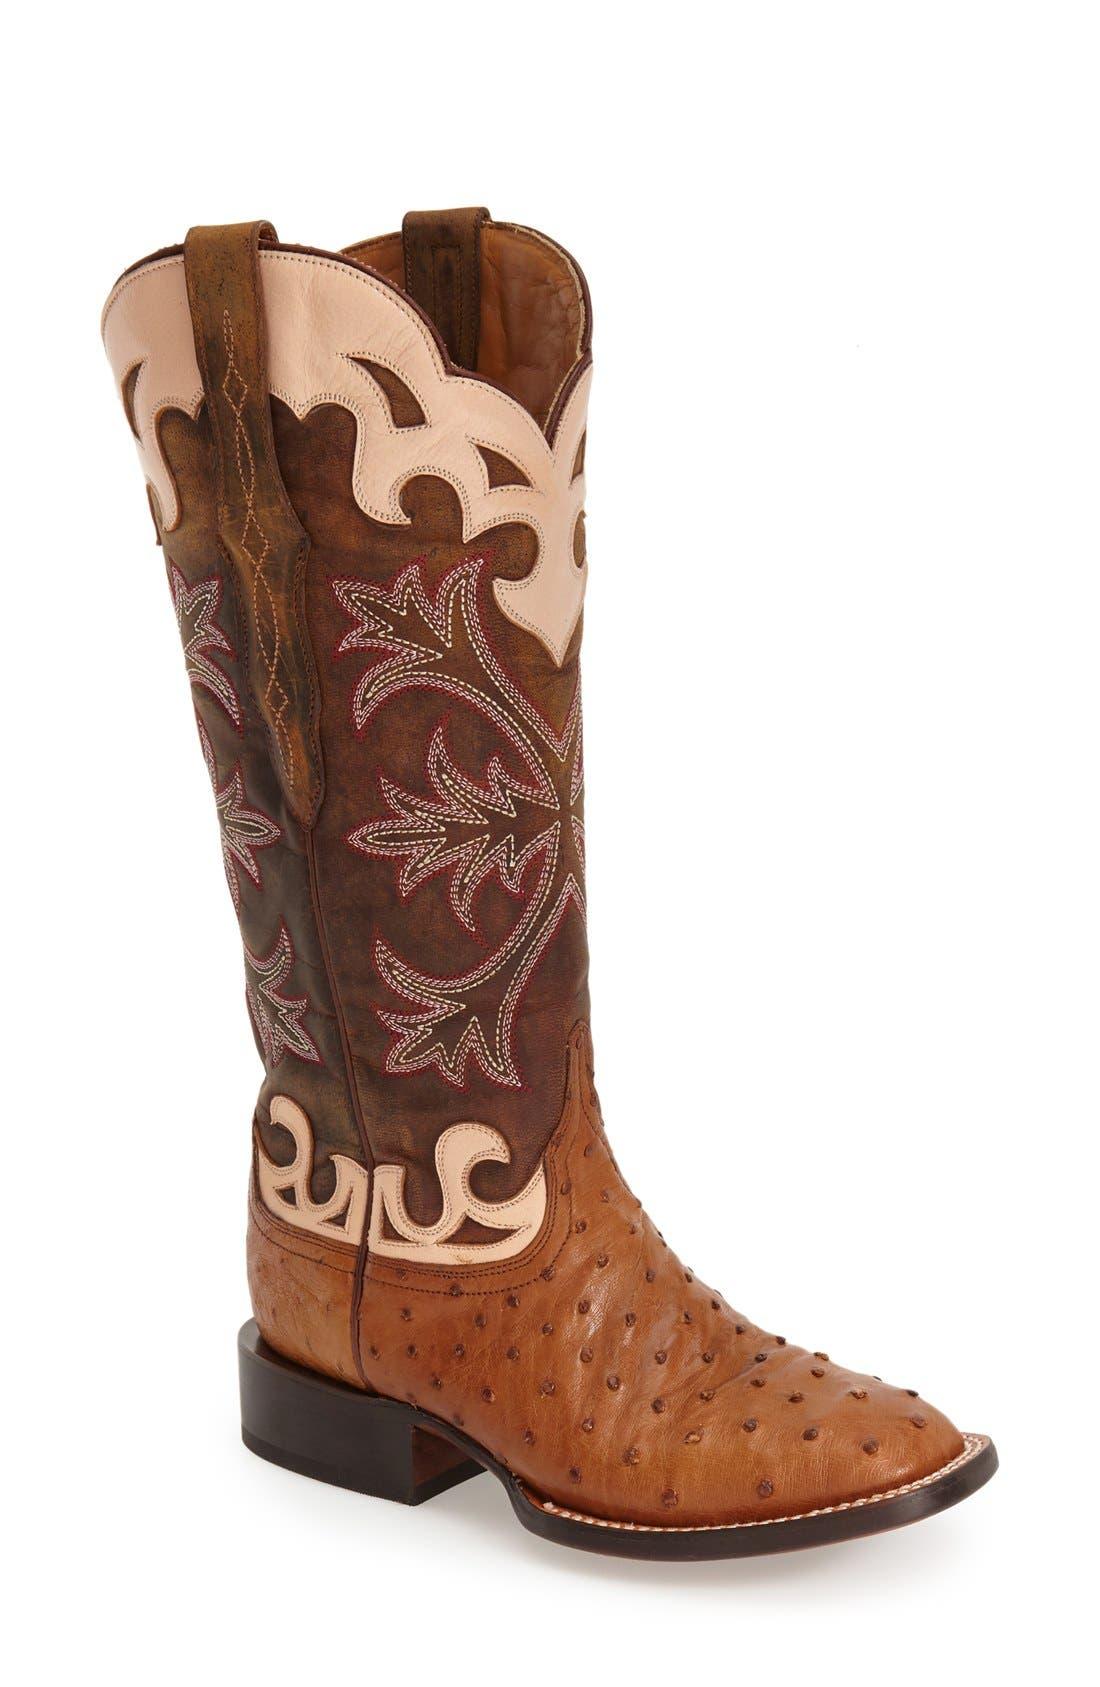 Main Image - Lucchese'Sienna' Western Boot (Women)